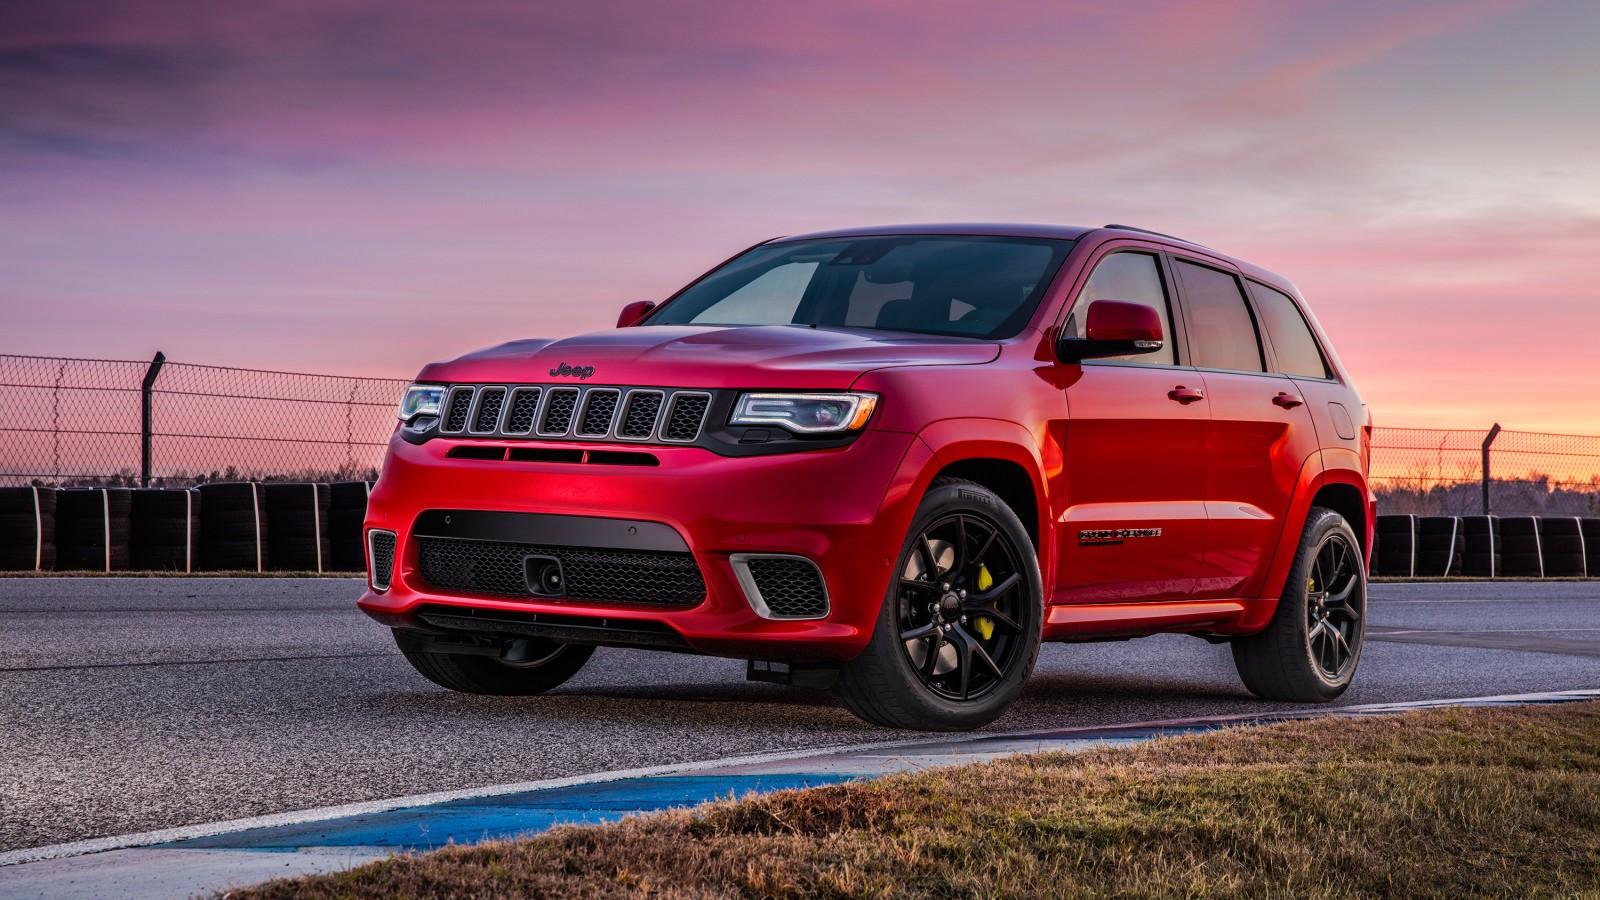 2018 Jeep Grand Cherokee Trackhawk Wallpaper Hd Car Wallpapers